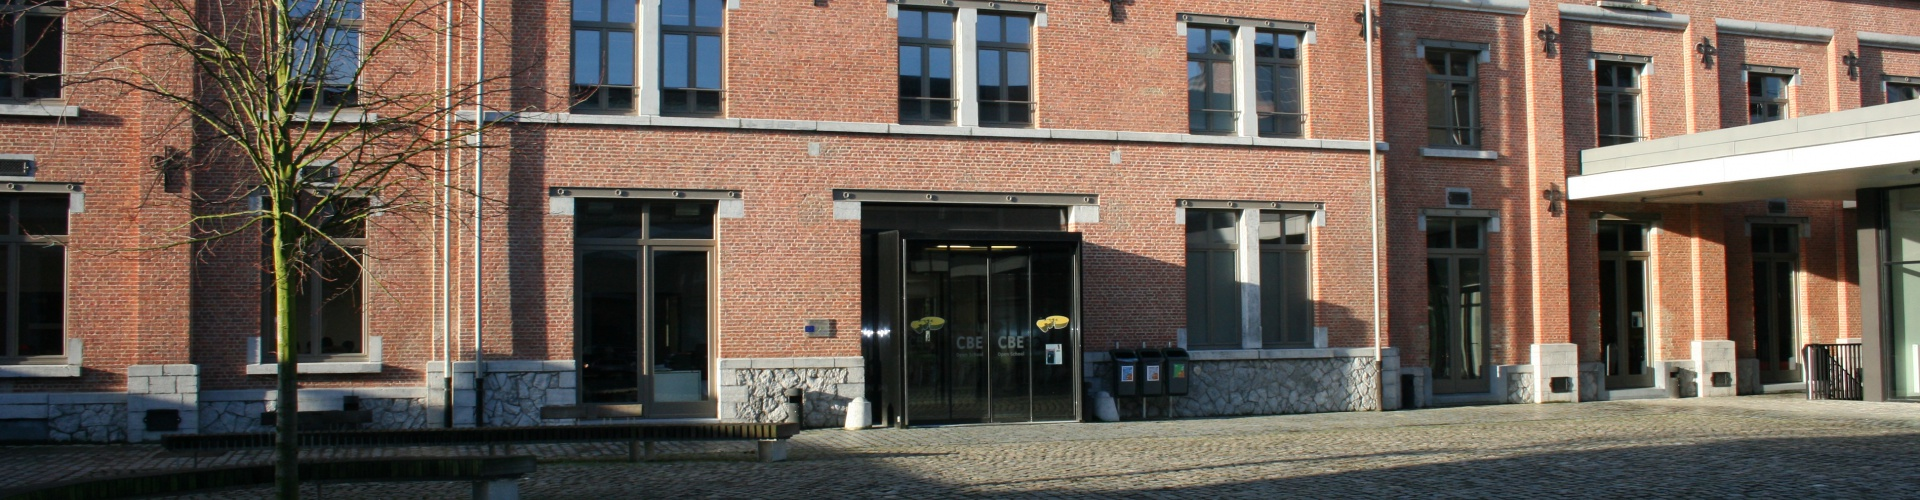 CBE Openschool Leuven